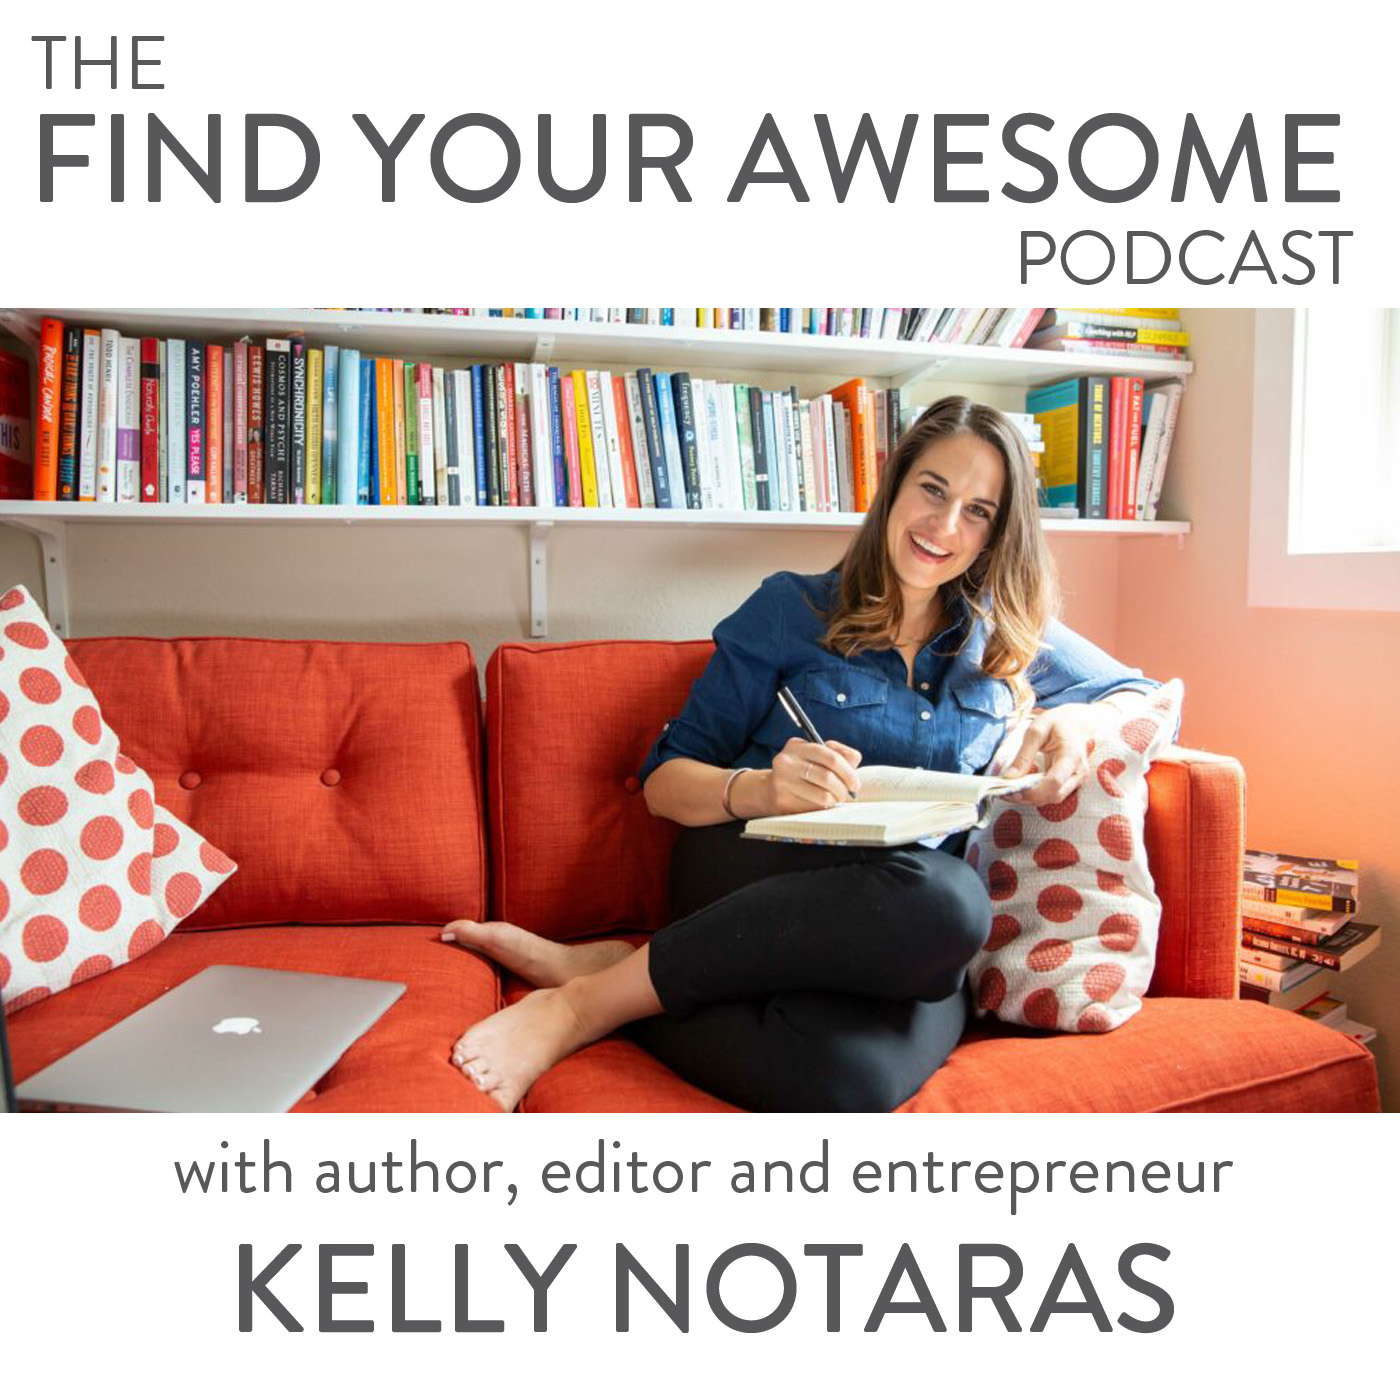 KellyNotaras_podcast_coverart.jpg